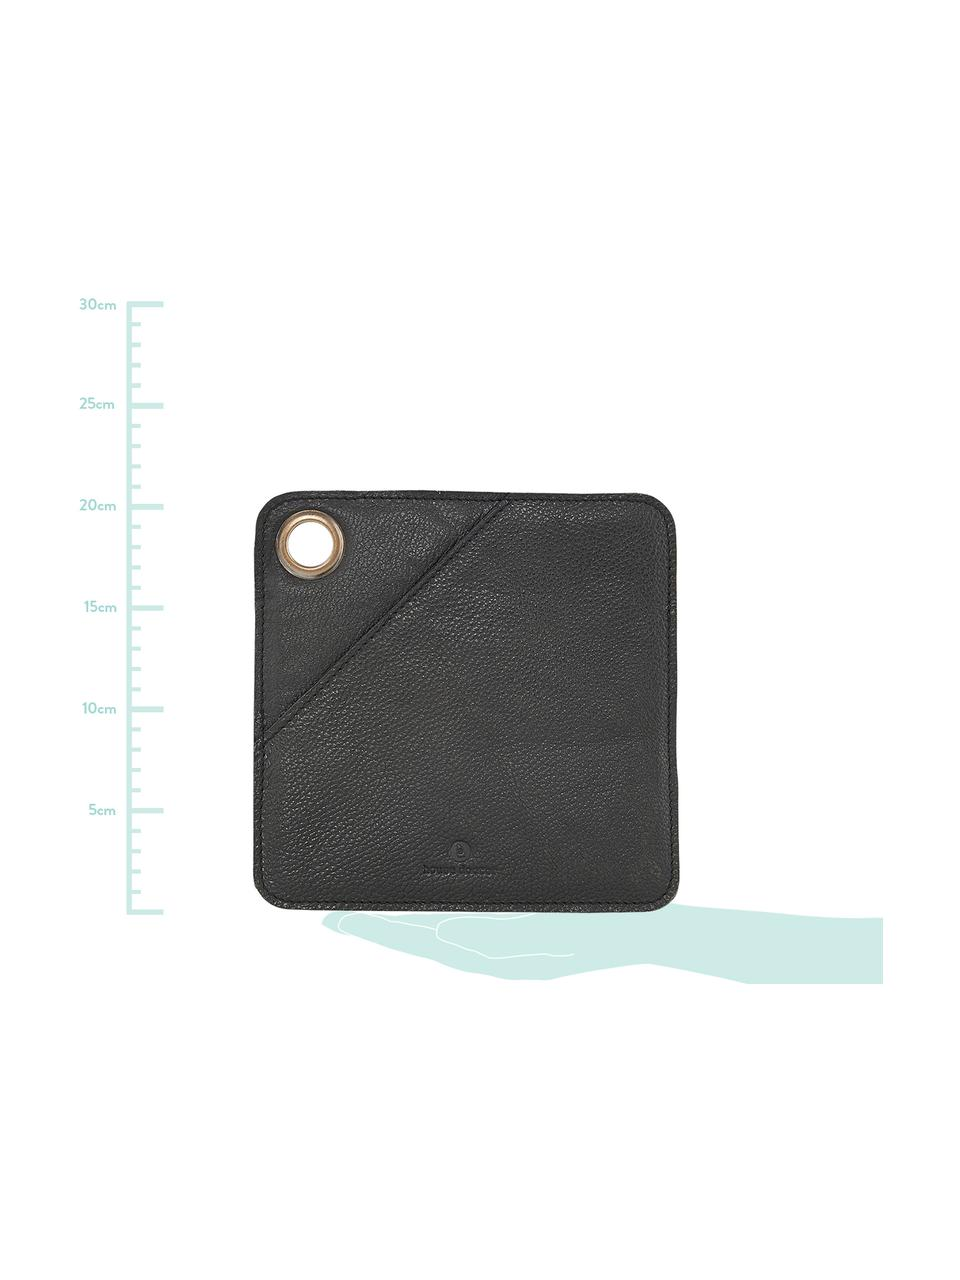 Leder-Topflappen Square, 2 Stück, Lappen: Leder, Öse: Metall, beschichtet, Schwarz, Messingfarben, 21 x 21 cm